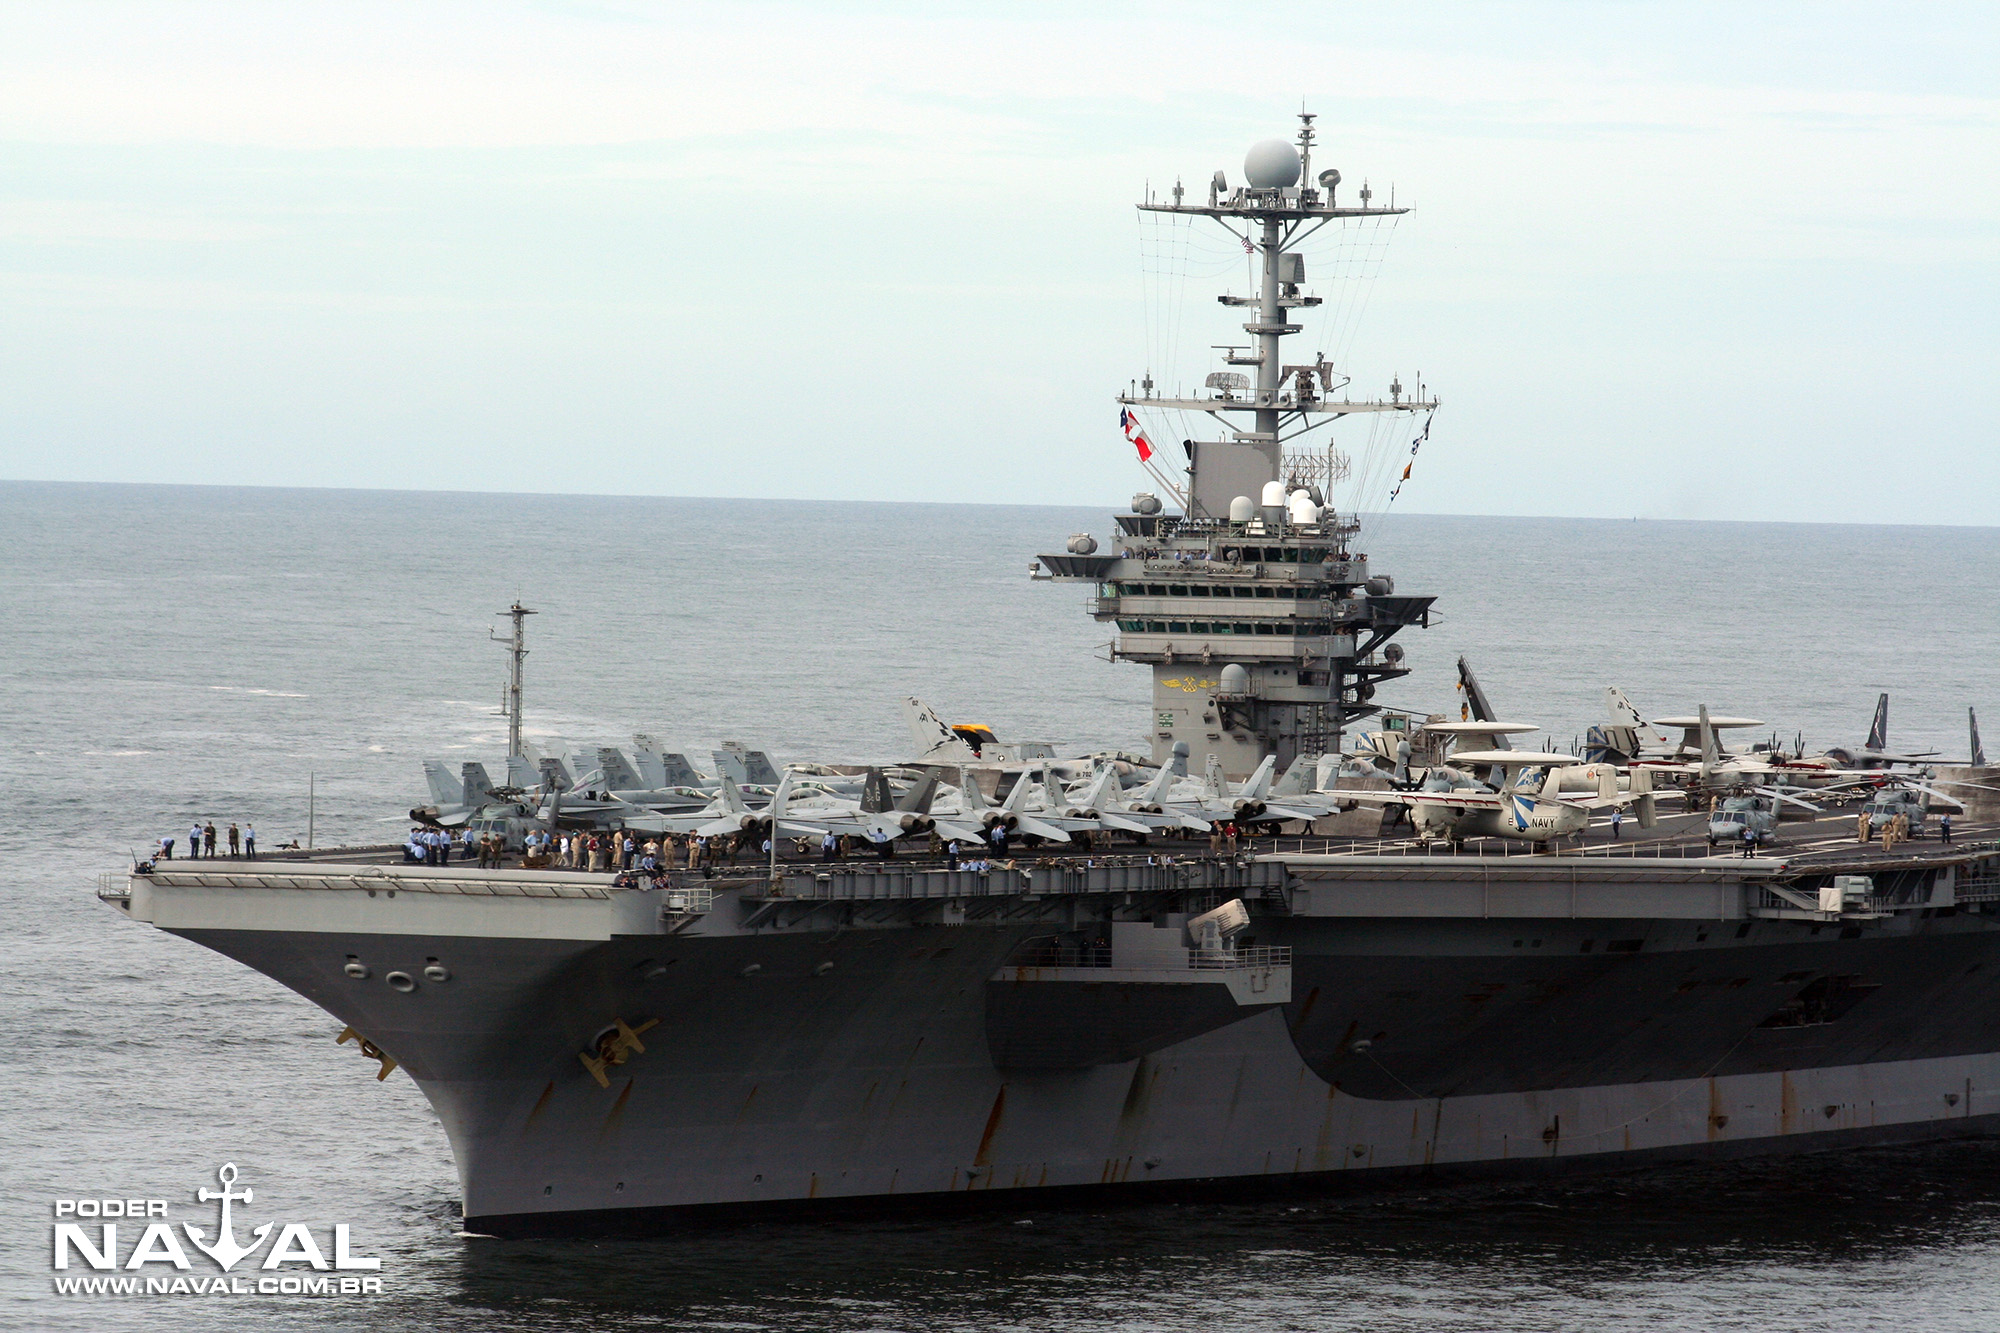 USS George Washington (CVN-73) no Rio - 2008 - 5